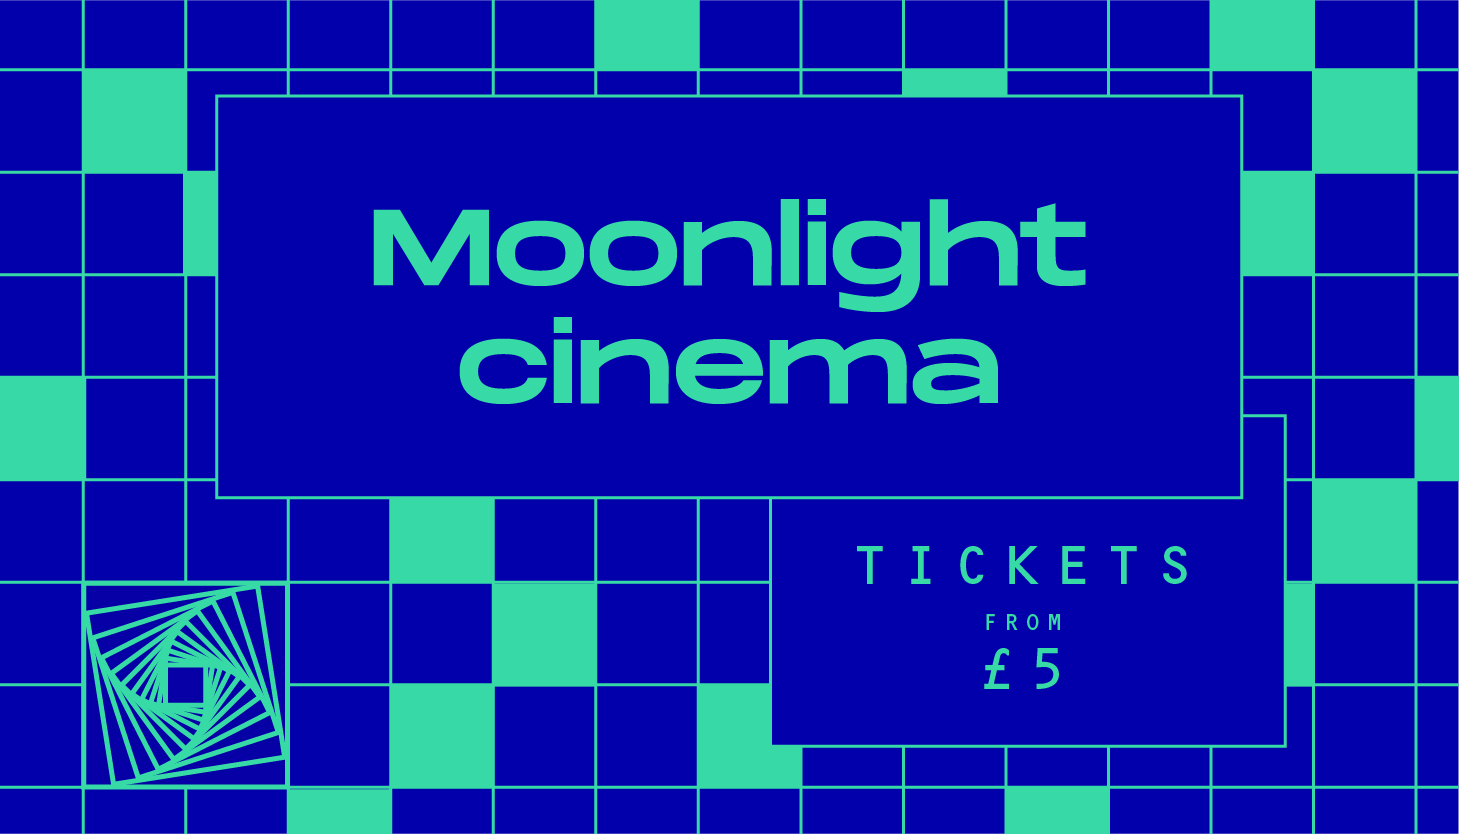 Moonlight Cinema Digbeth Arena